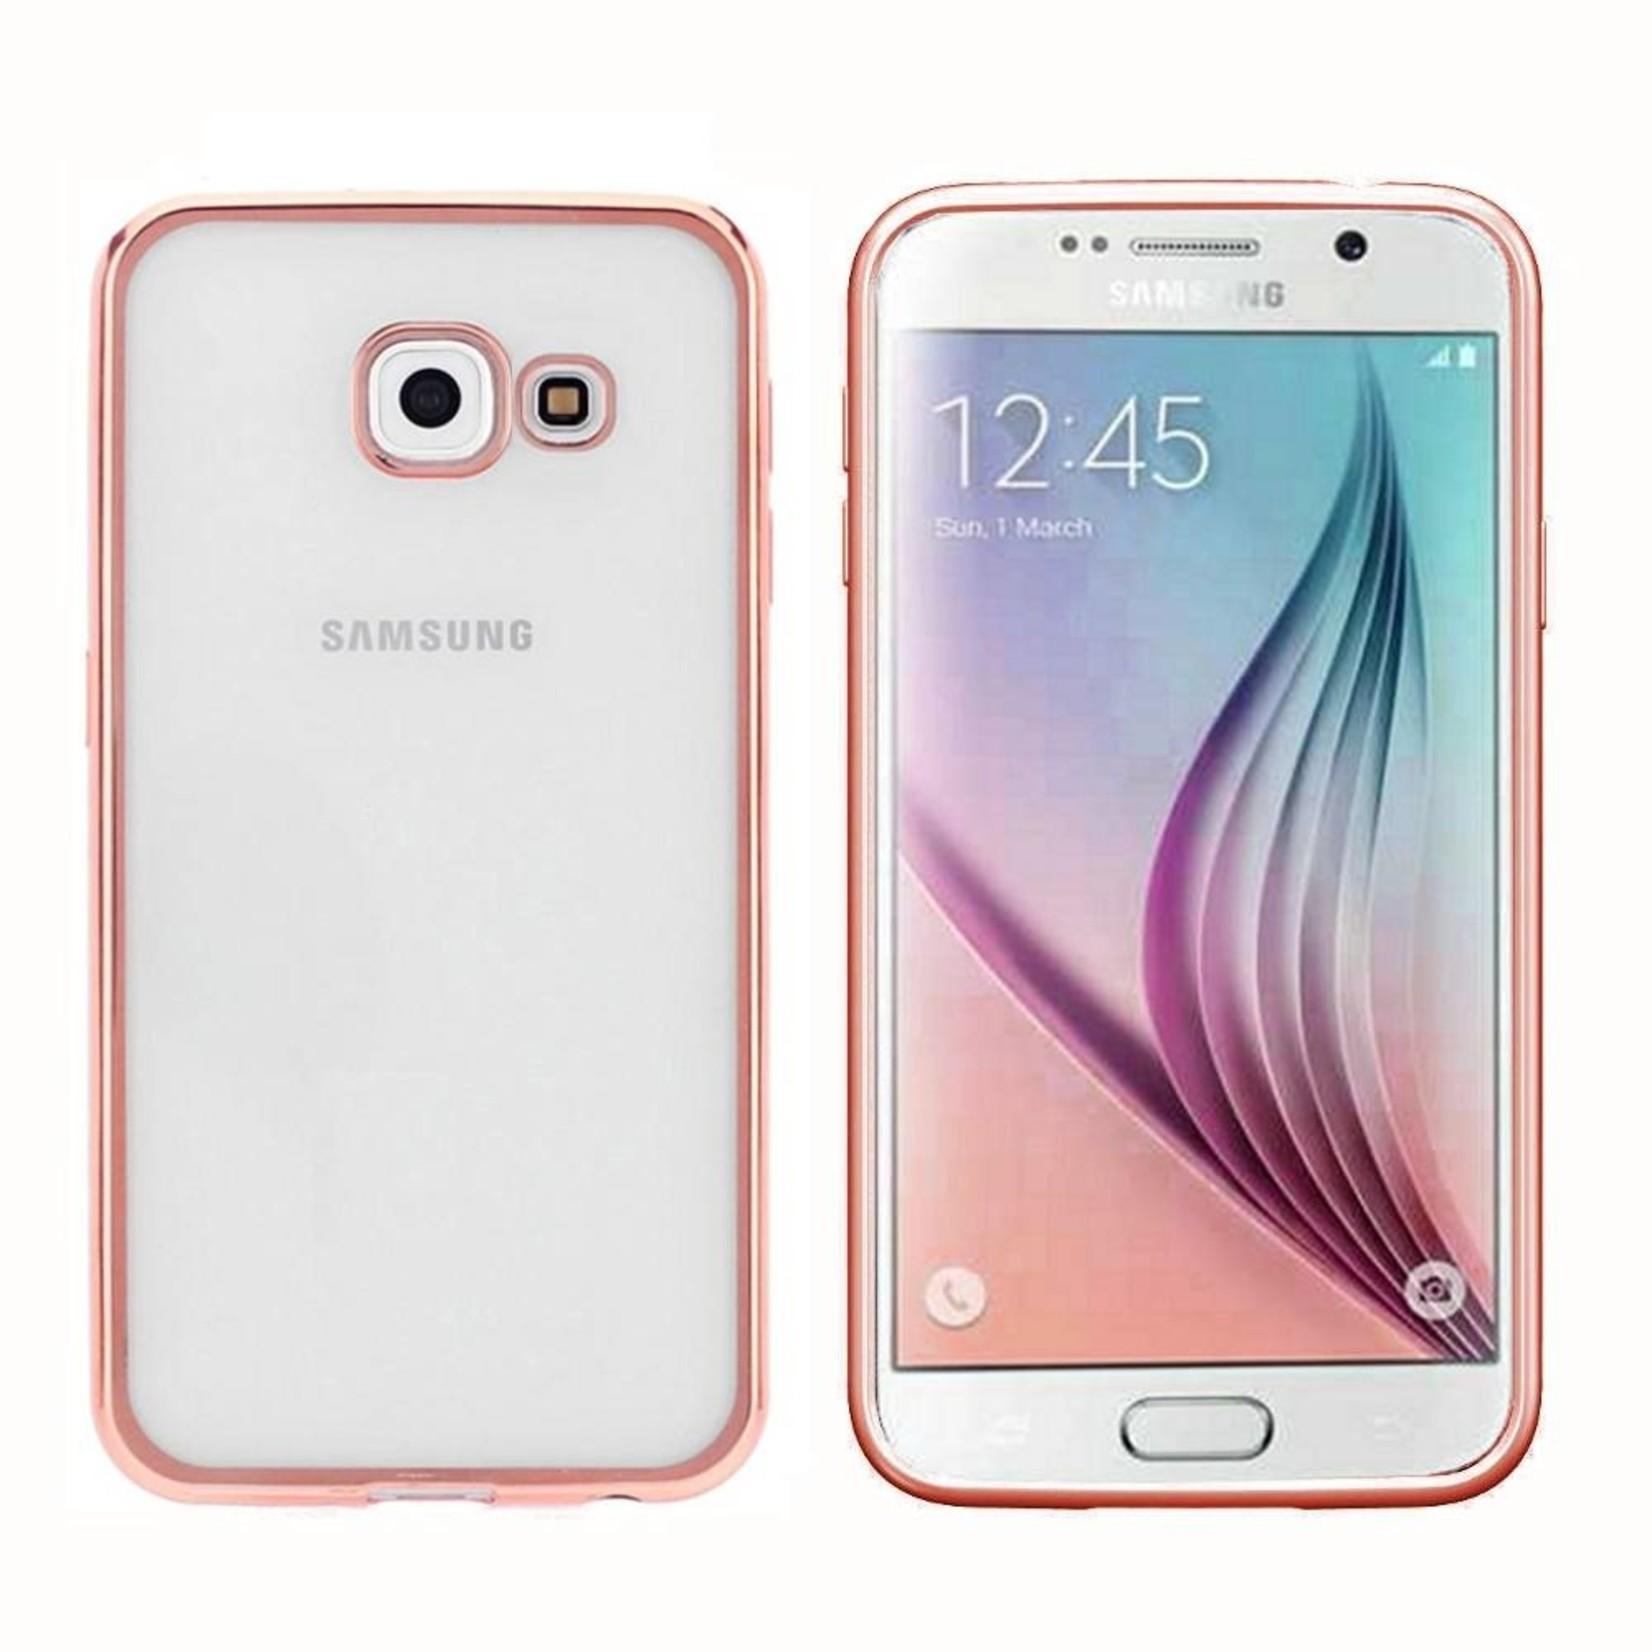 Colorfone Hoesje CoolSkin Bumper Clear Samsung A3 2016 Rosé Goud